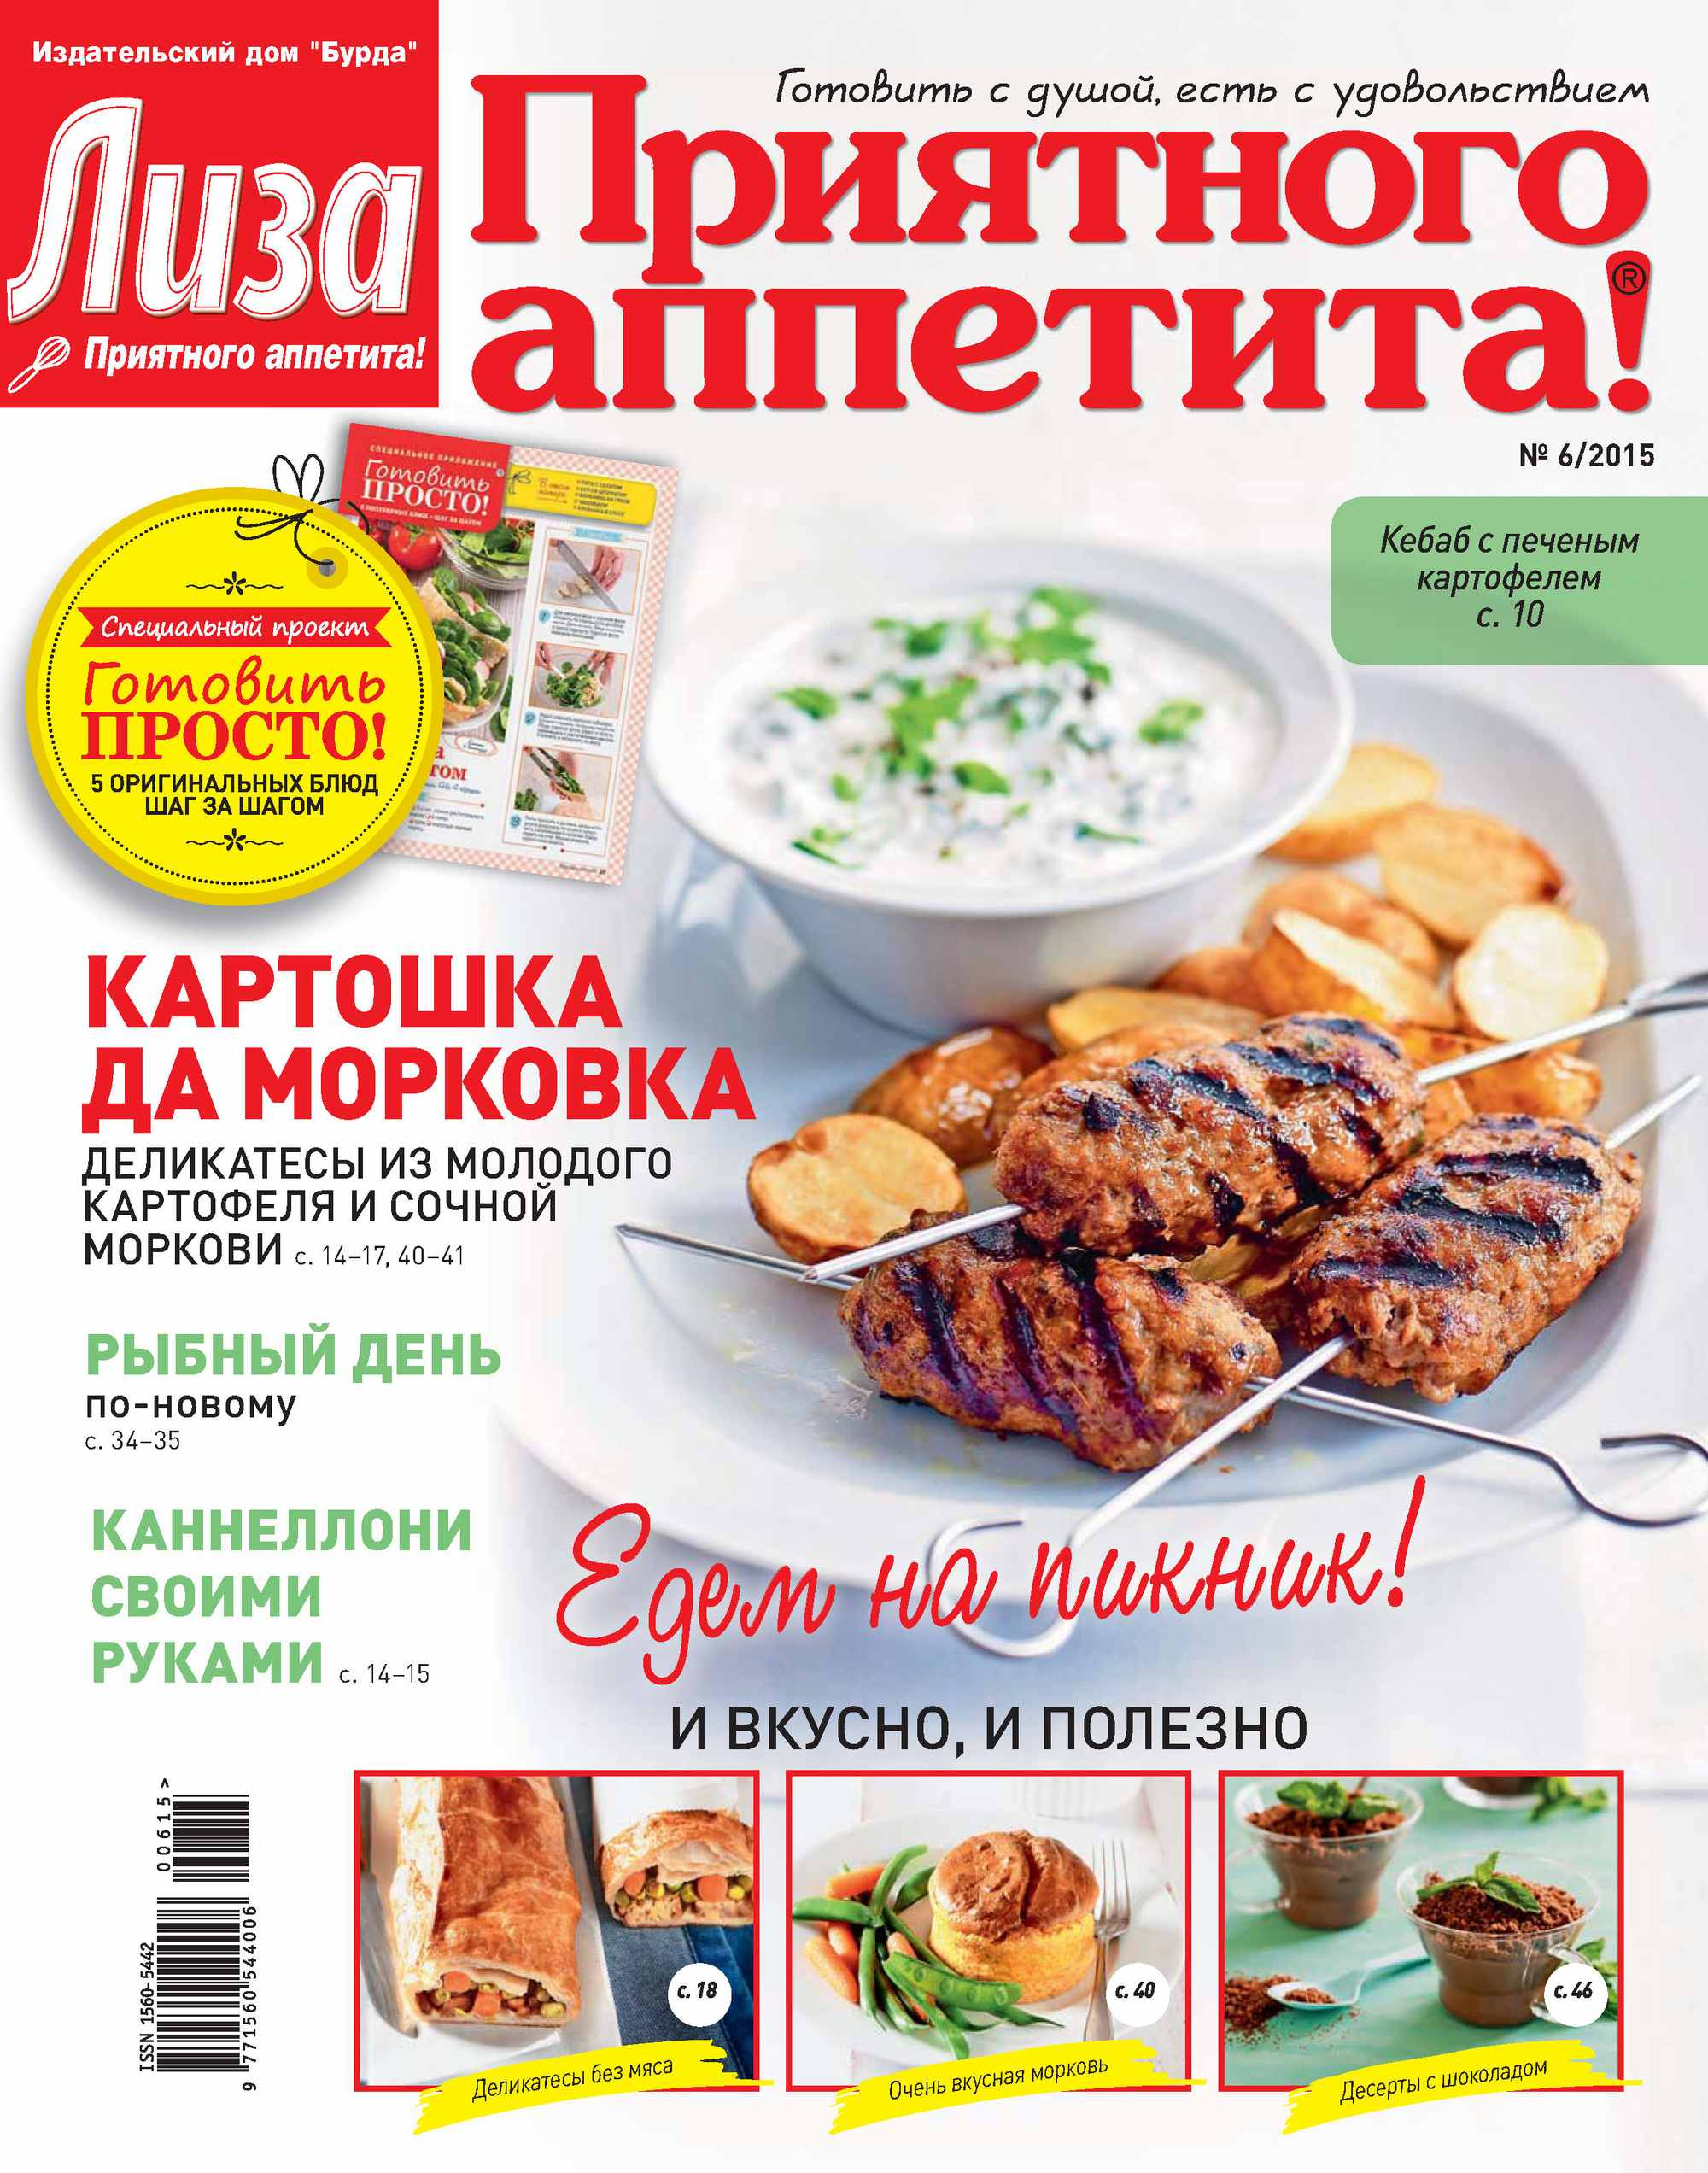 ИД «Бурда» Журнал «Лиза. Приятного аппетита» №06/2015 ид бурда журнал лиза приятного аппетита 04 2015